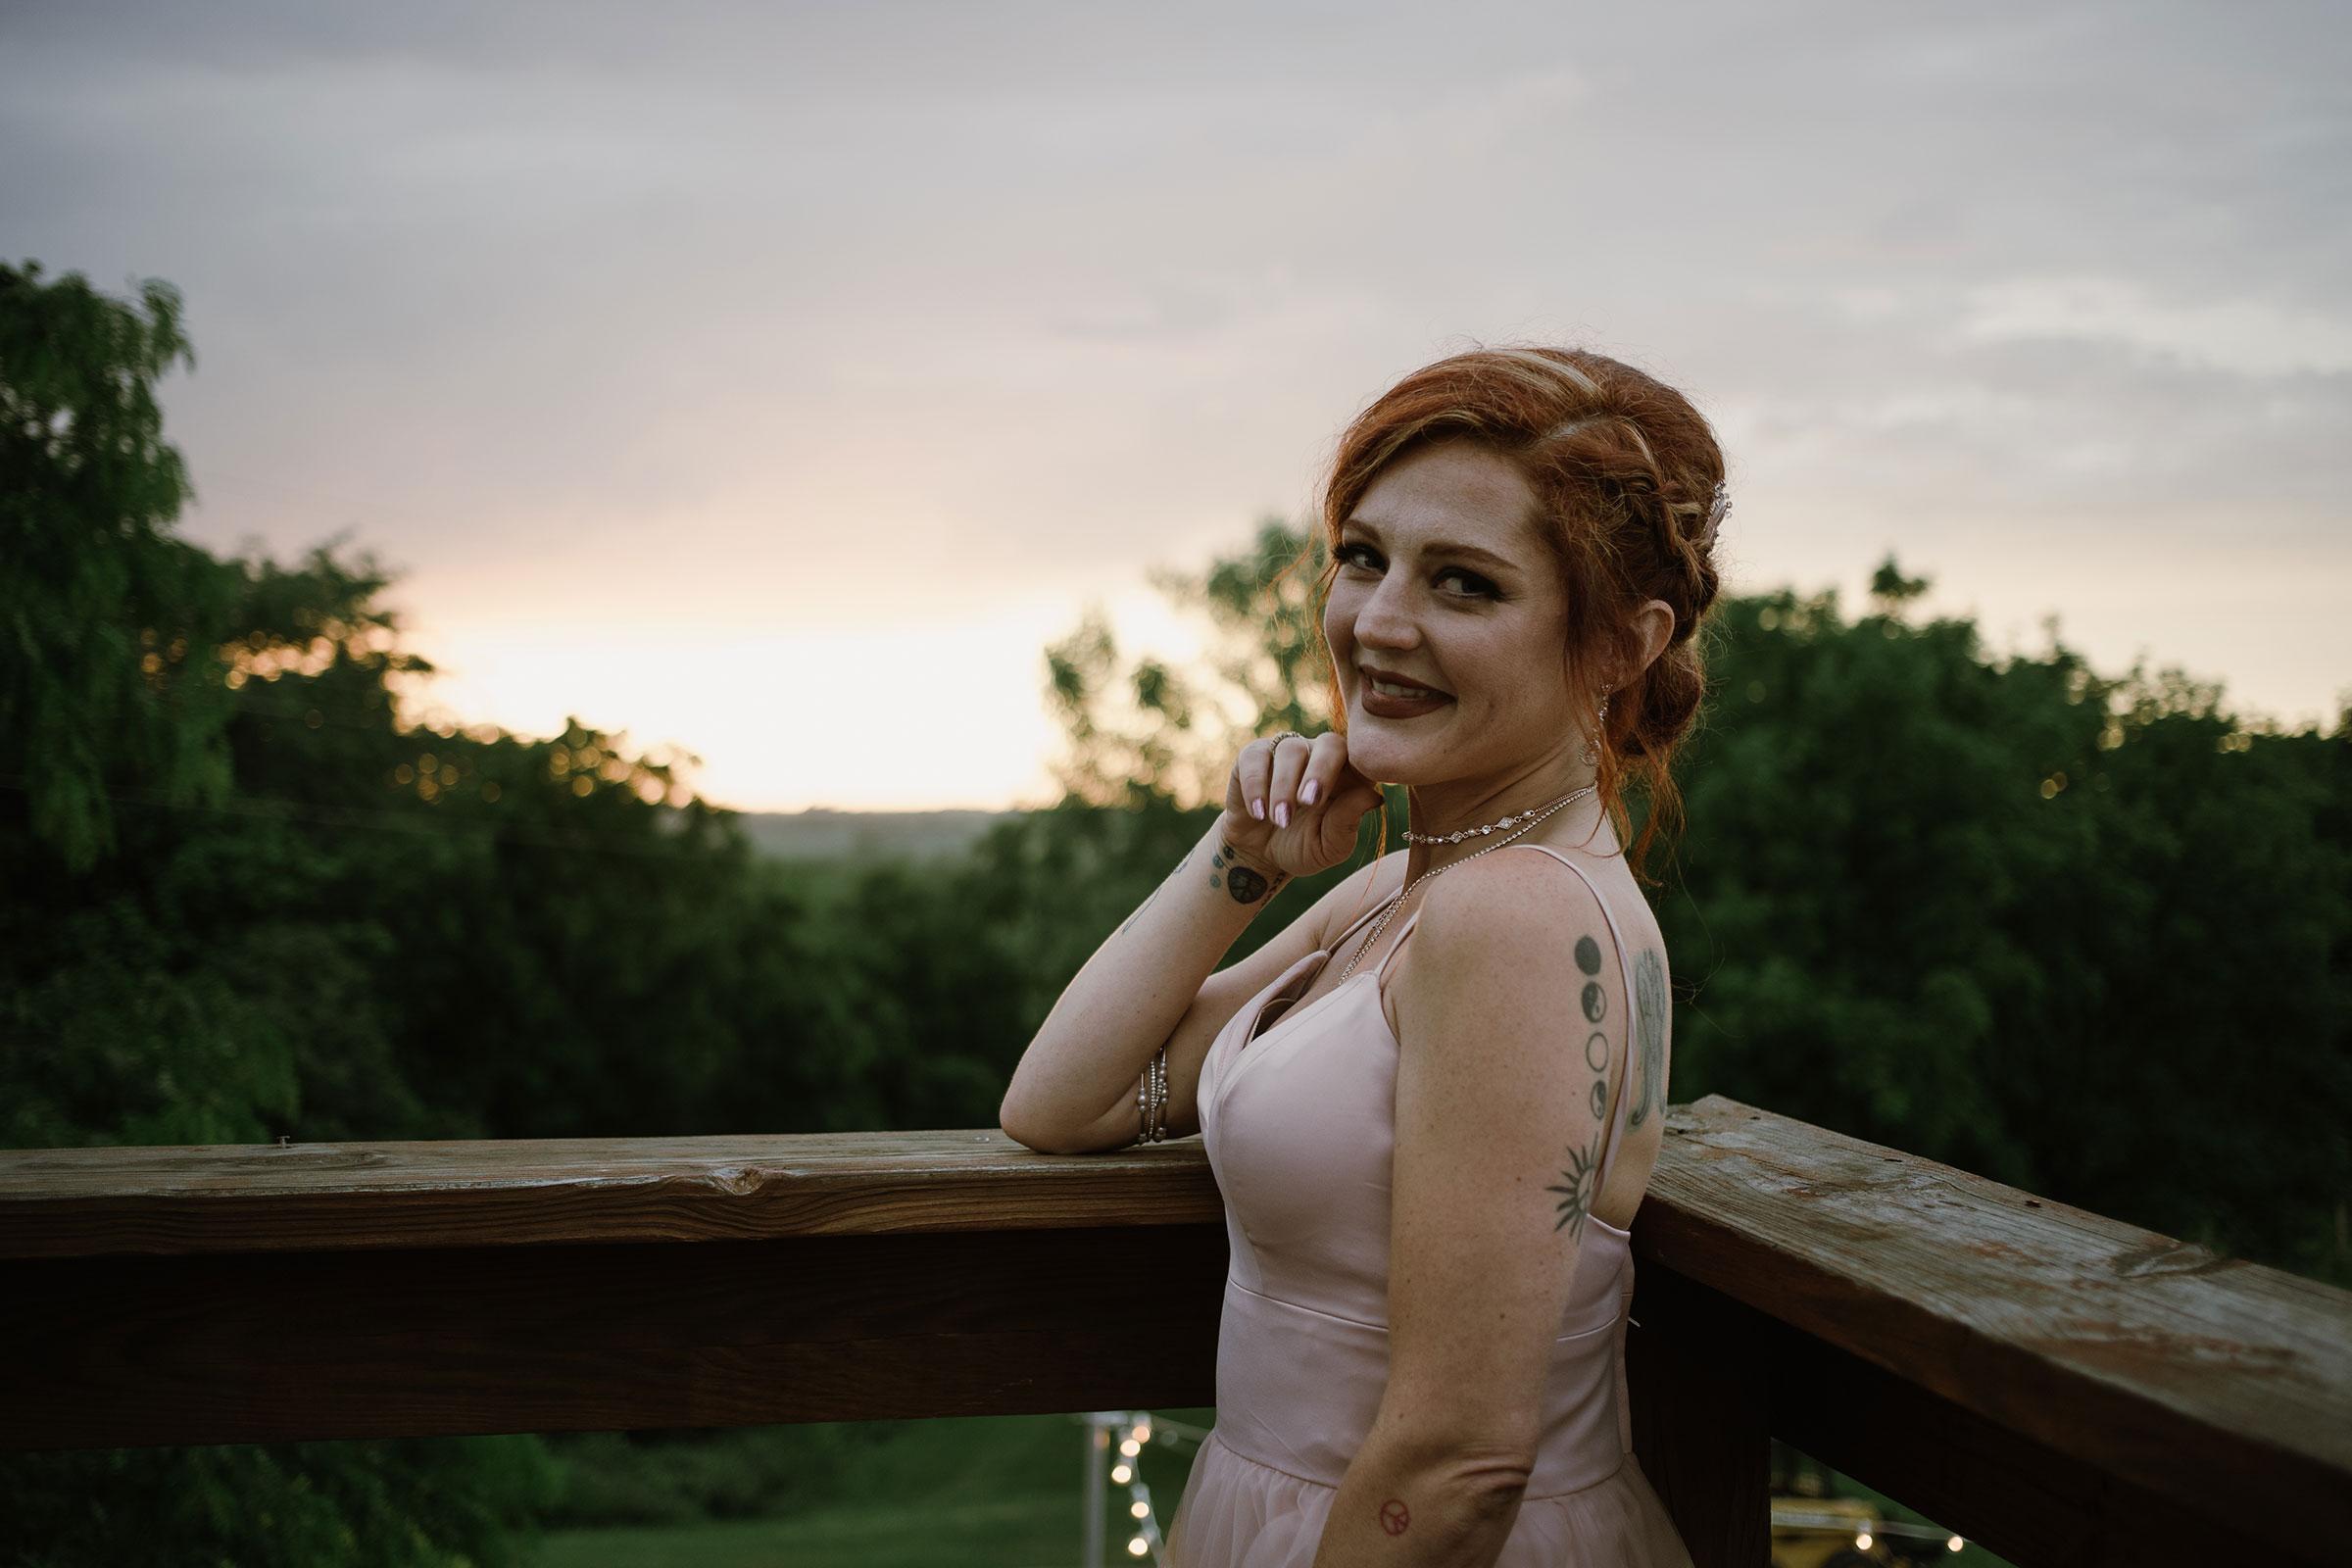 bridesmaid-posing-outside-with-sunset-wedding-summerset-winery-indianola-iowa-raelyn-ramey-photography.jpg